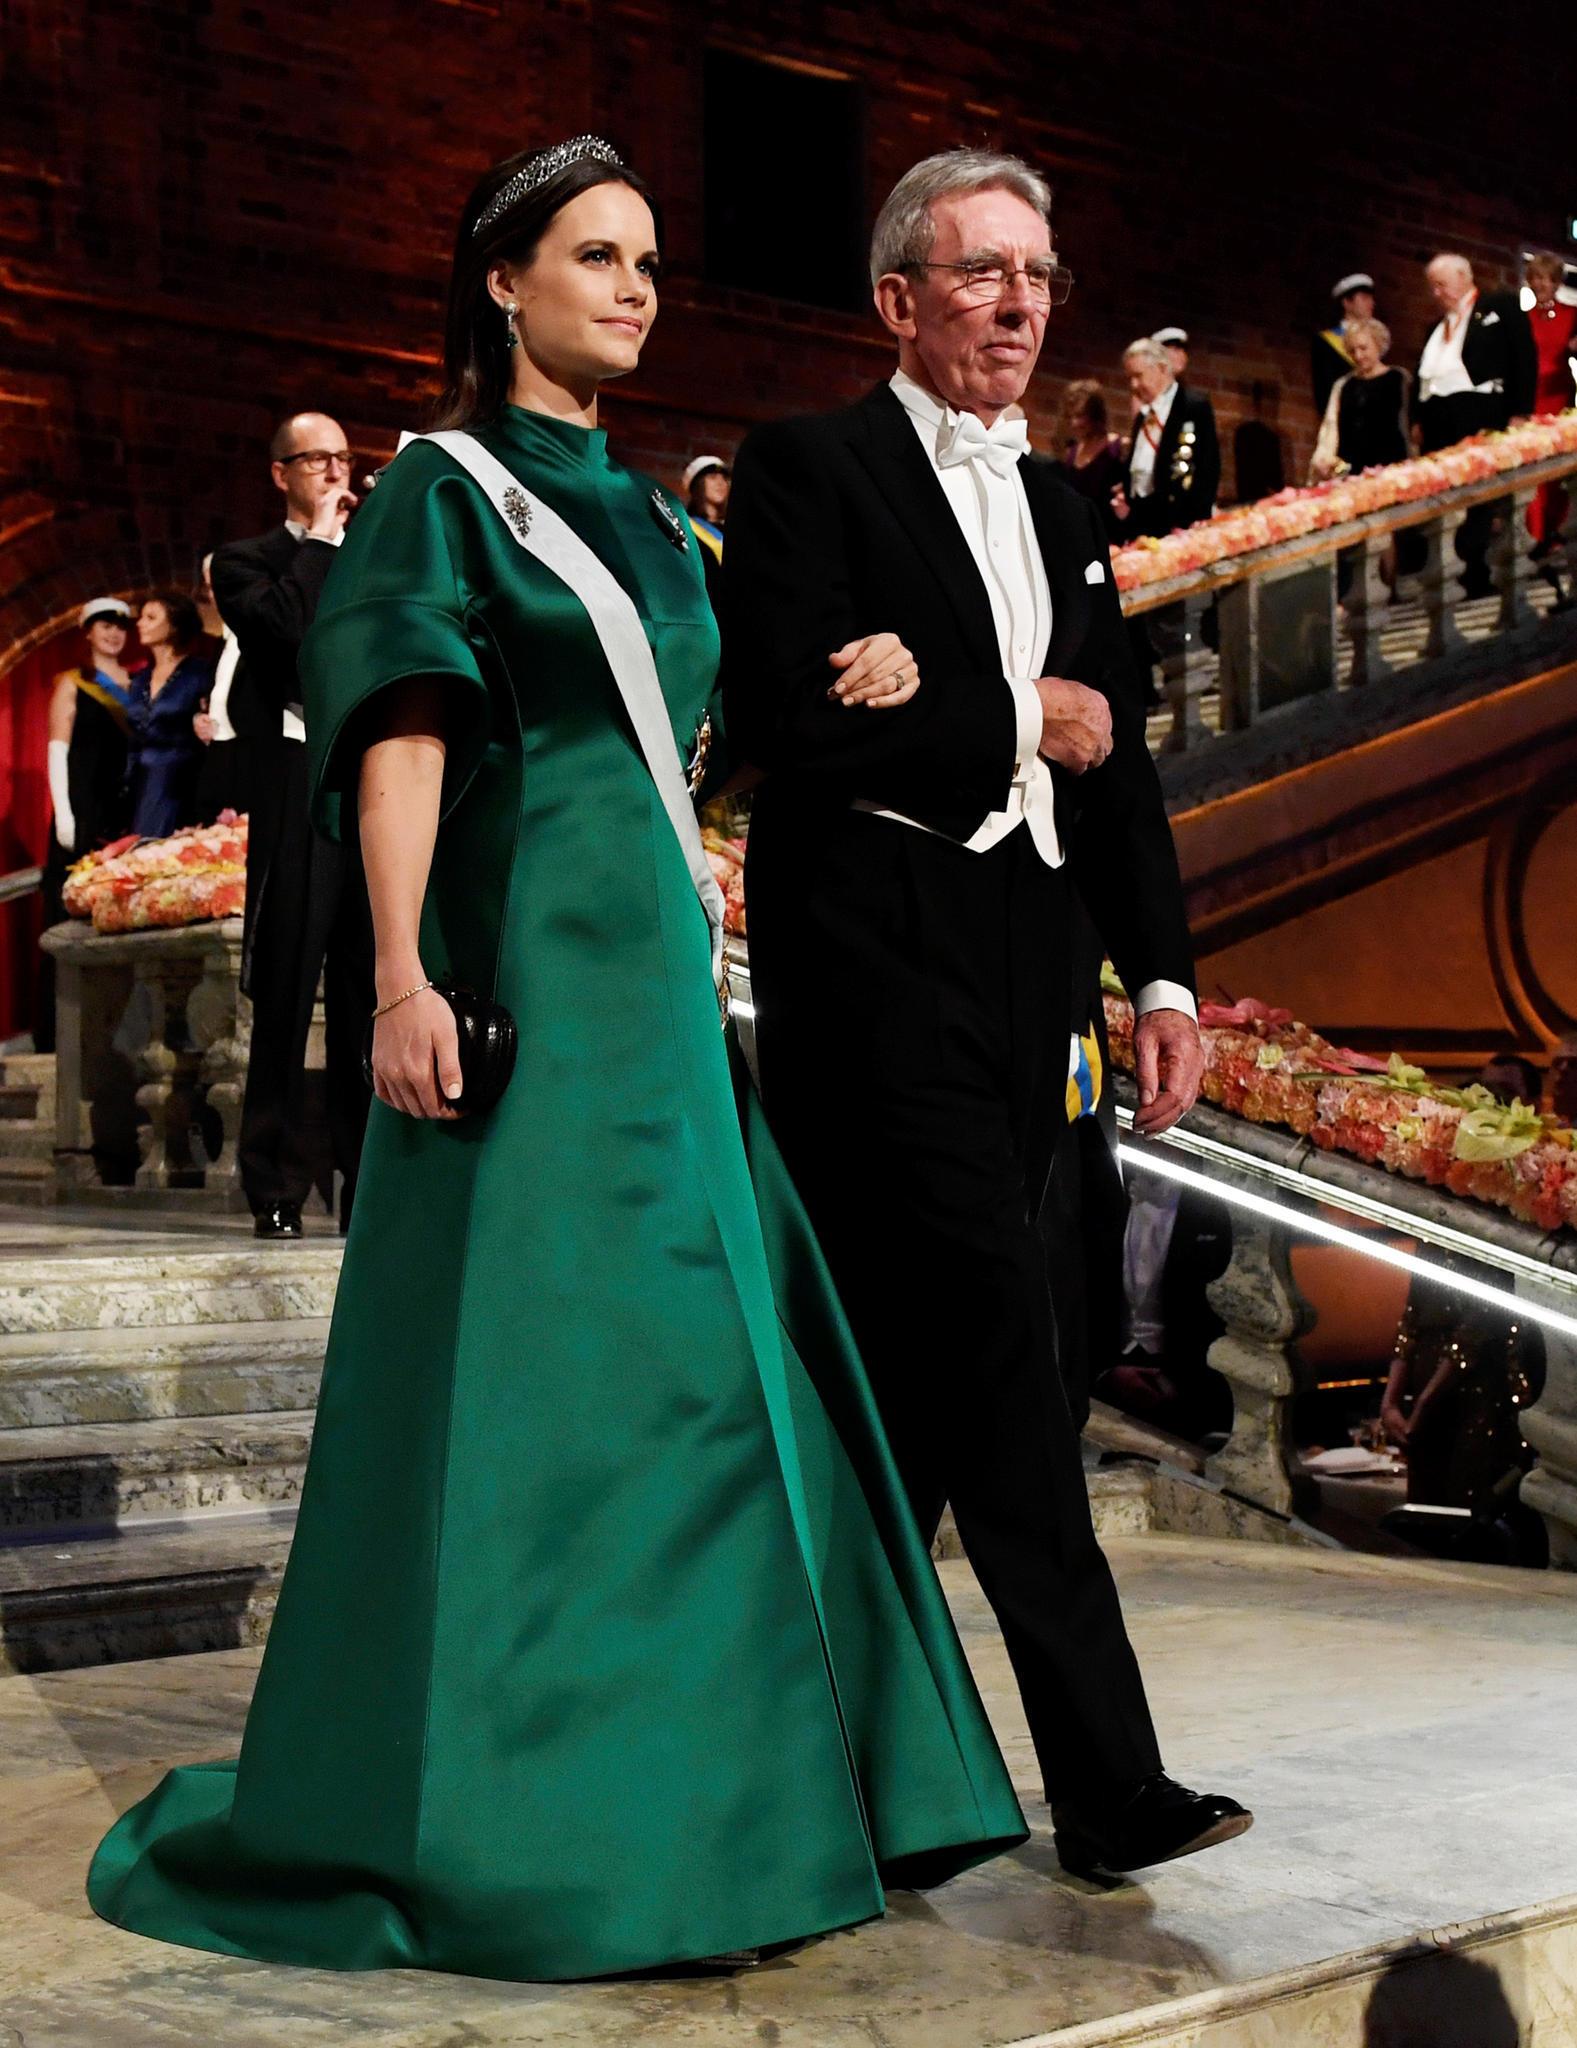 Prinzessin Sofia bei der Nobelpreisverleihung 2016.